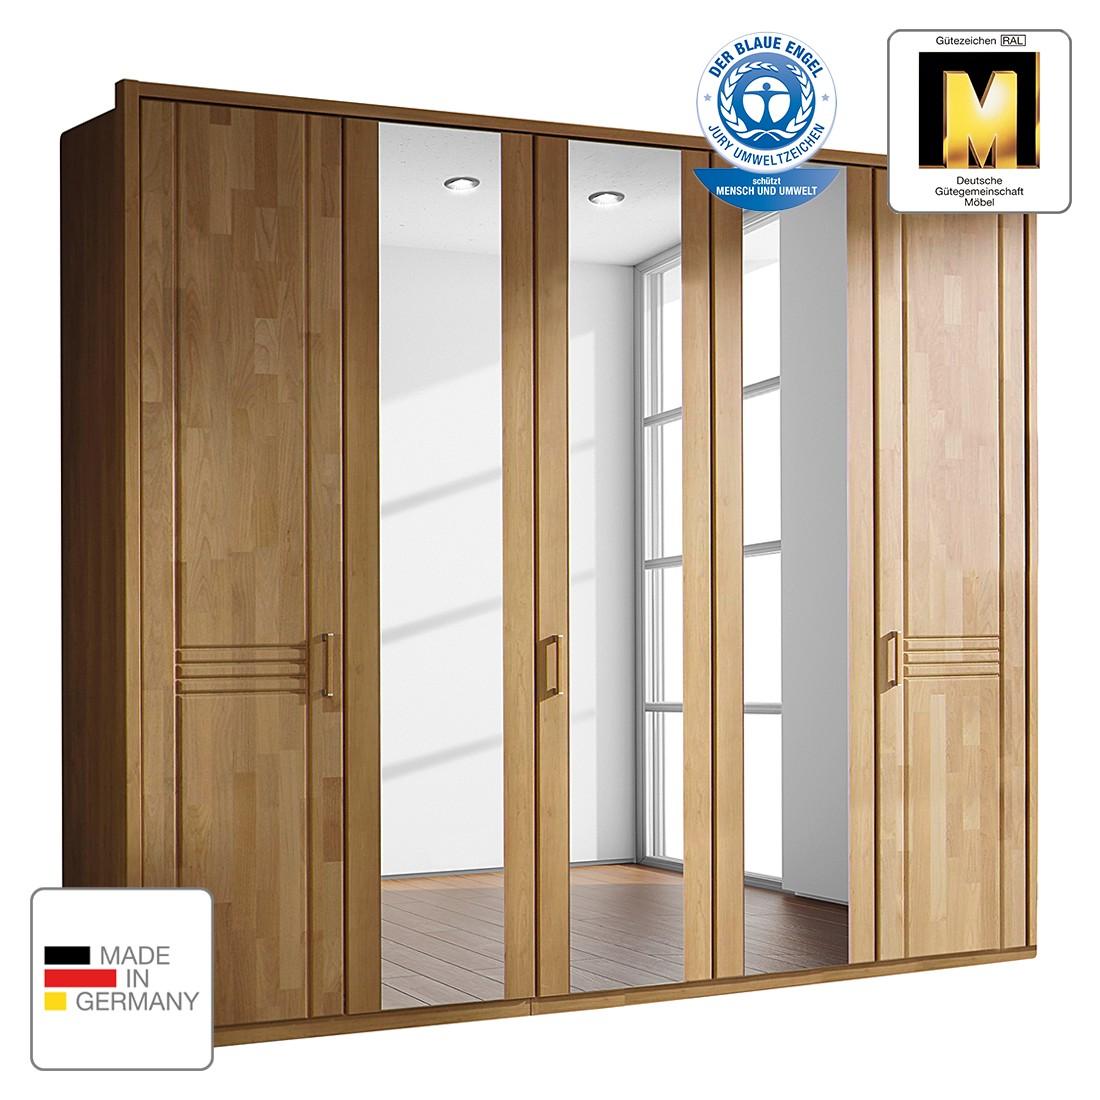 goedkoop Draaideurkast Savina Wild eikenhout 142cm 3 deurs 1 spiegeldeur Met Passe partout lijst Rauch Steffen